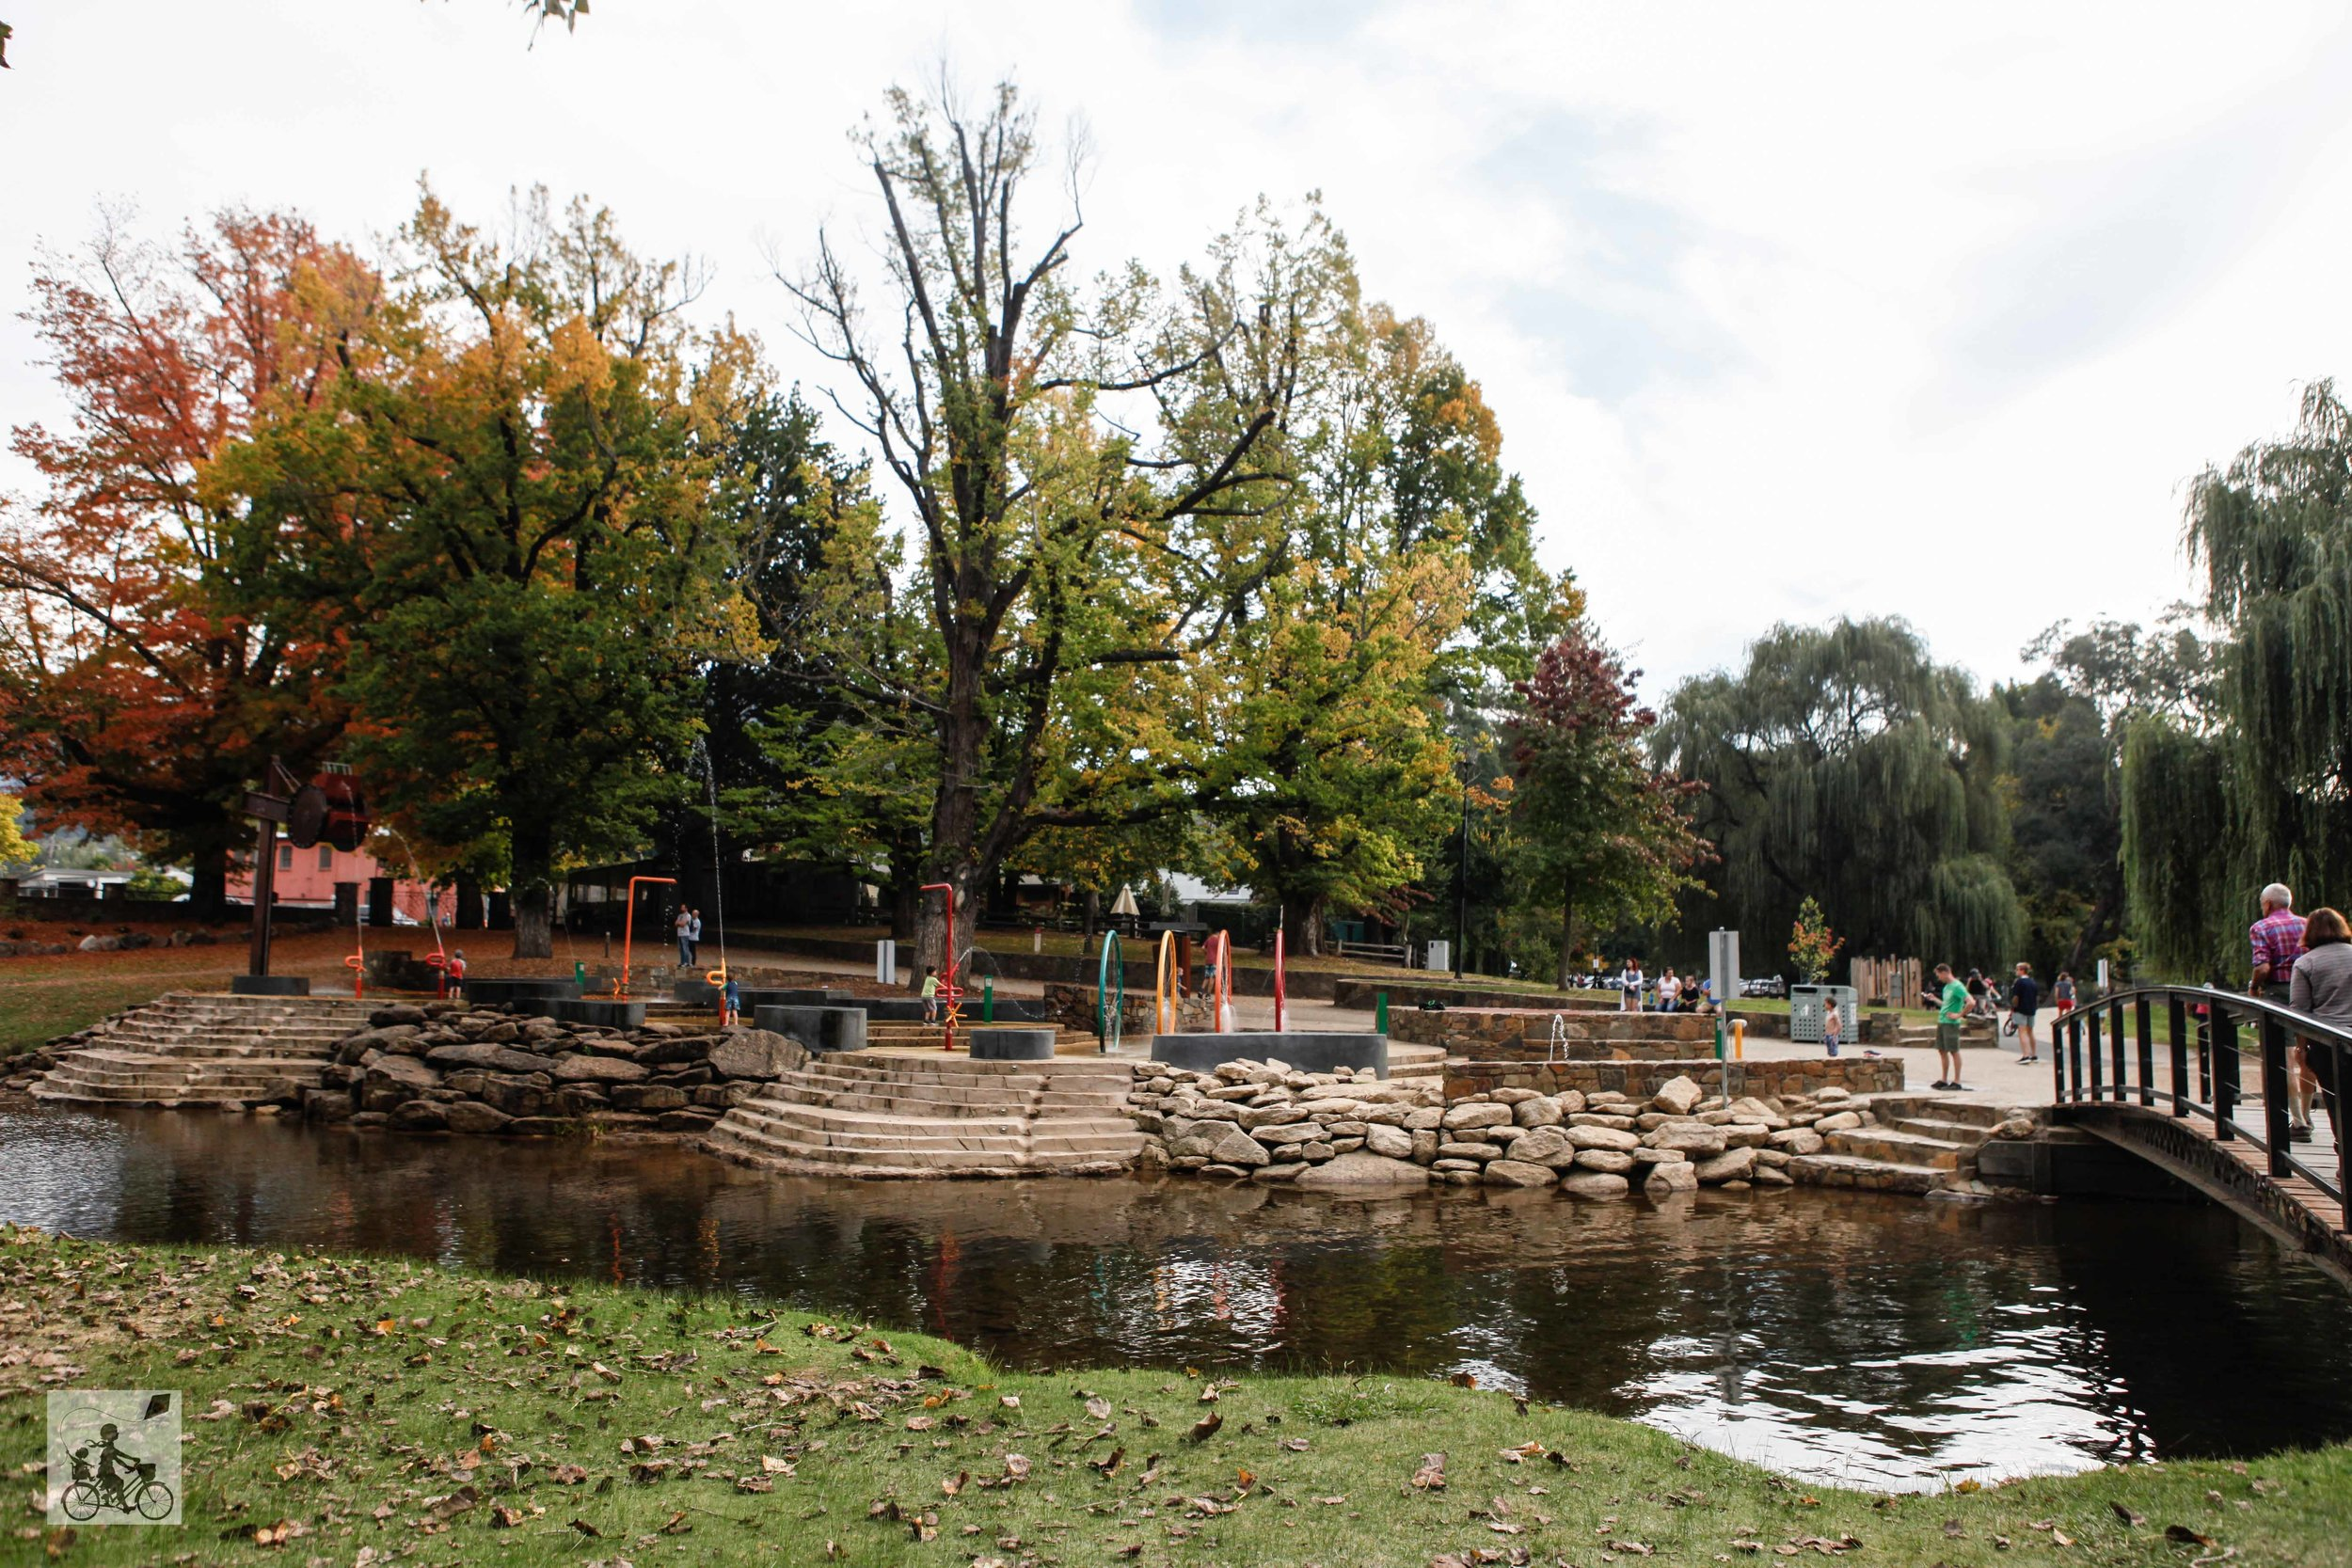 Mamma Knows East - Bright Splashpark Water play